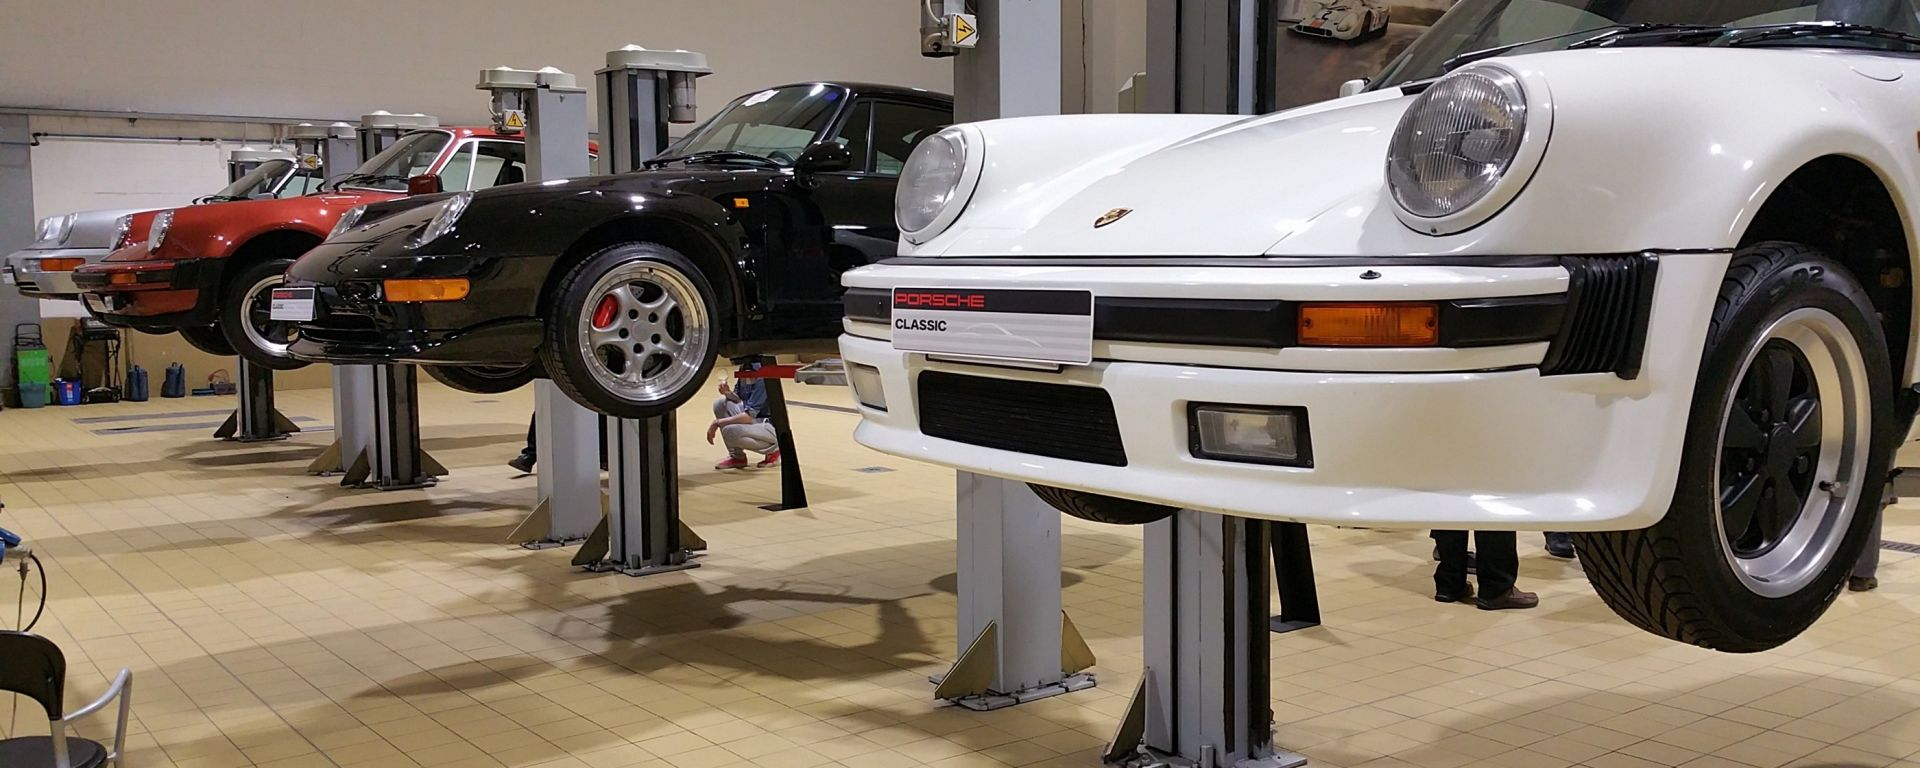 Partner Porsche Classic